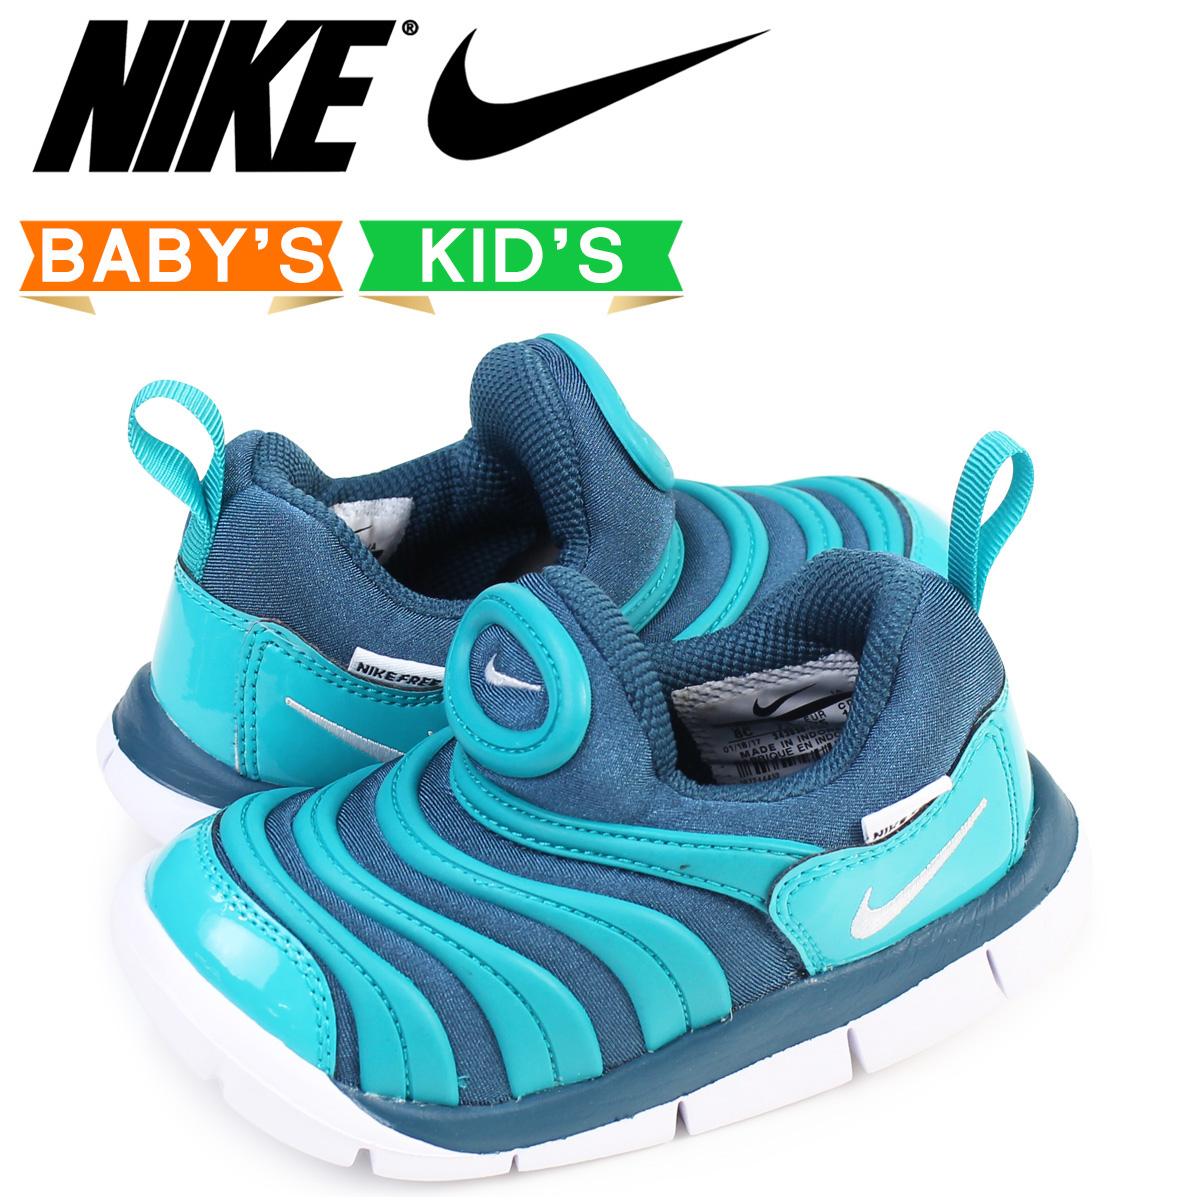 sneak online shop nike nike dynamo free kids jr child shoes sneakers dynamo free td 343 938. Black Bedroom Furniture Sets. Home Design Ideas